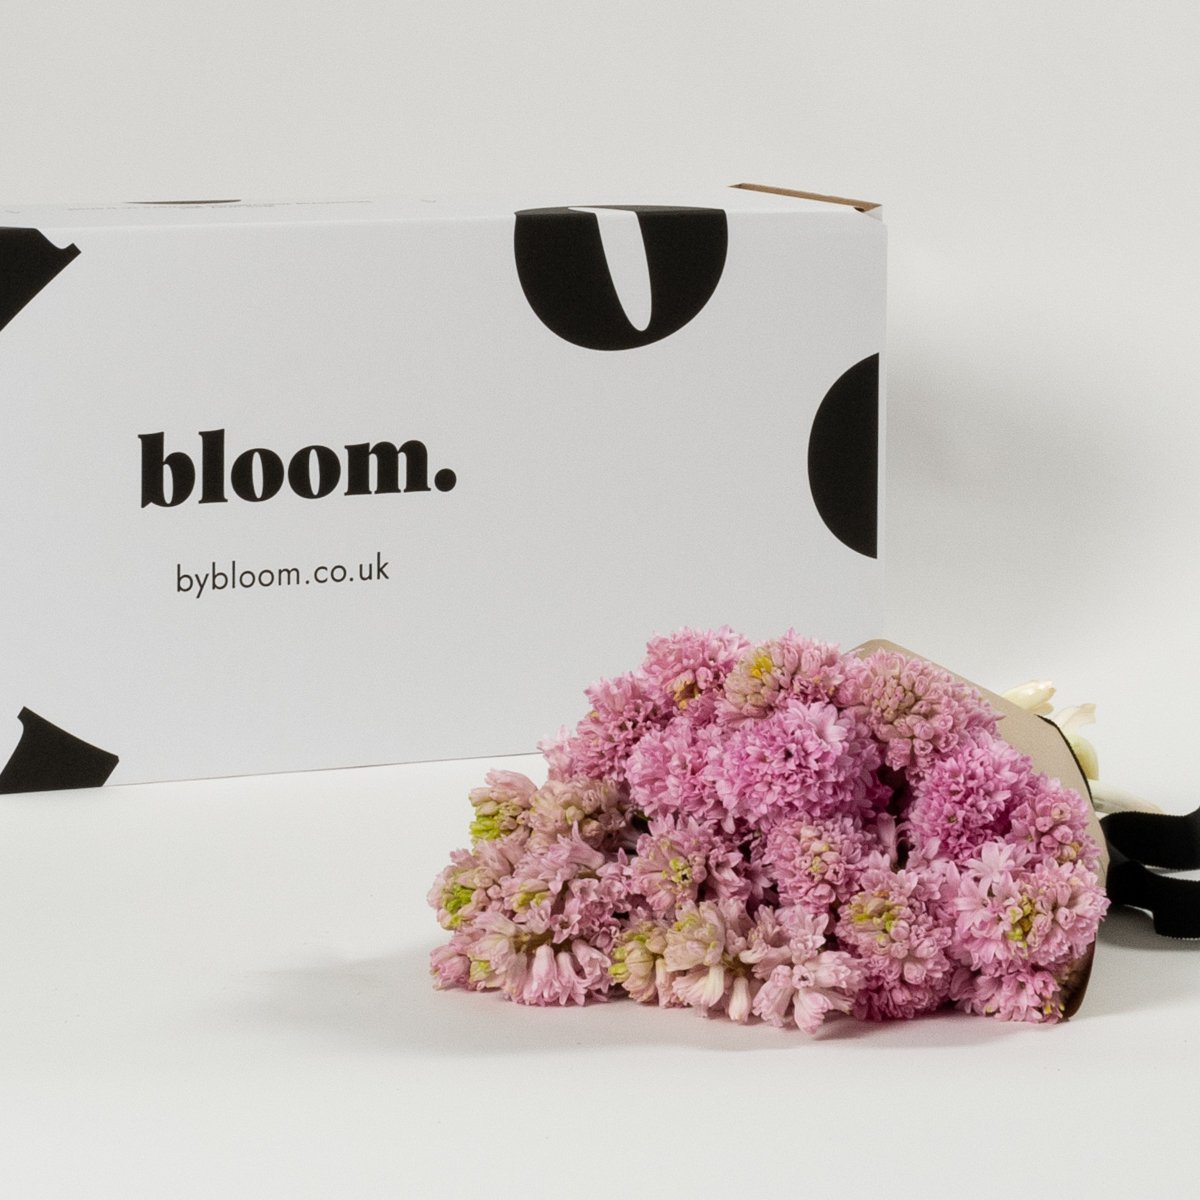 Bloom Flower Delivery | Dusky Pink Hyacinths